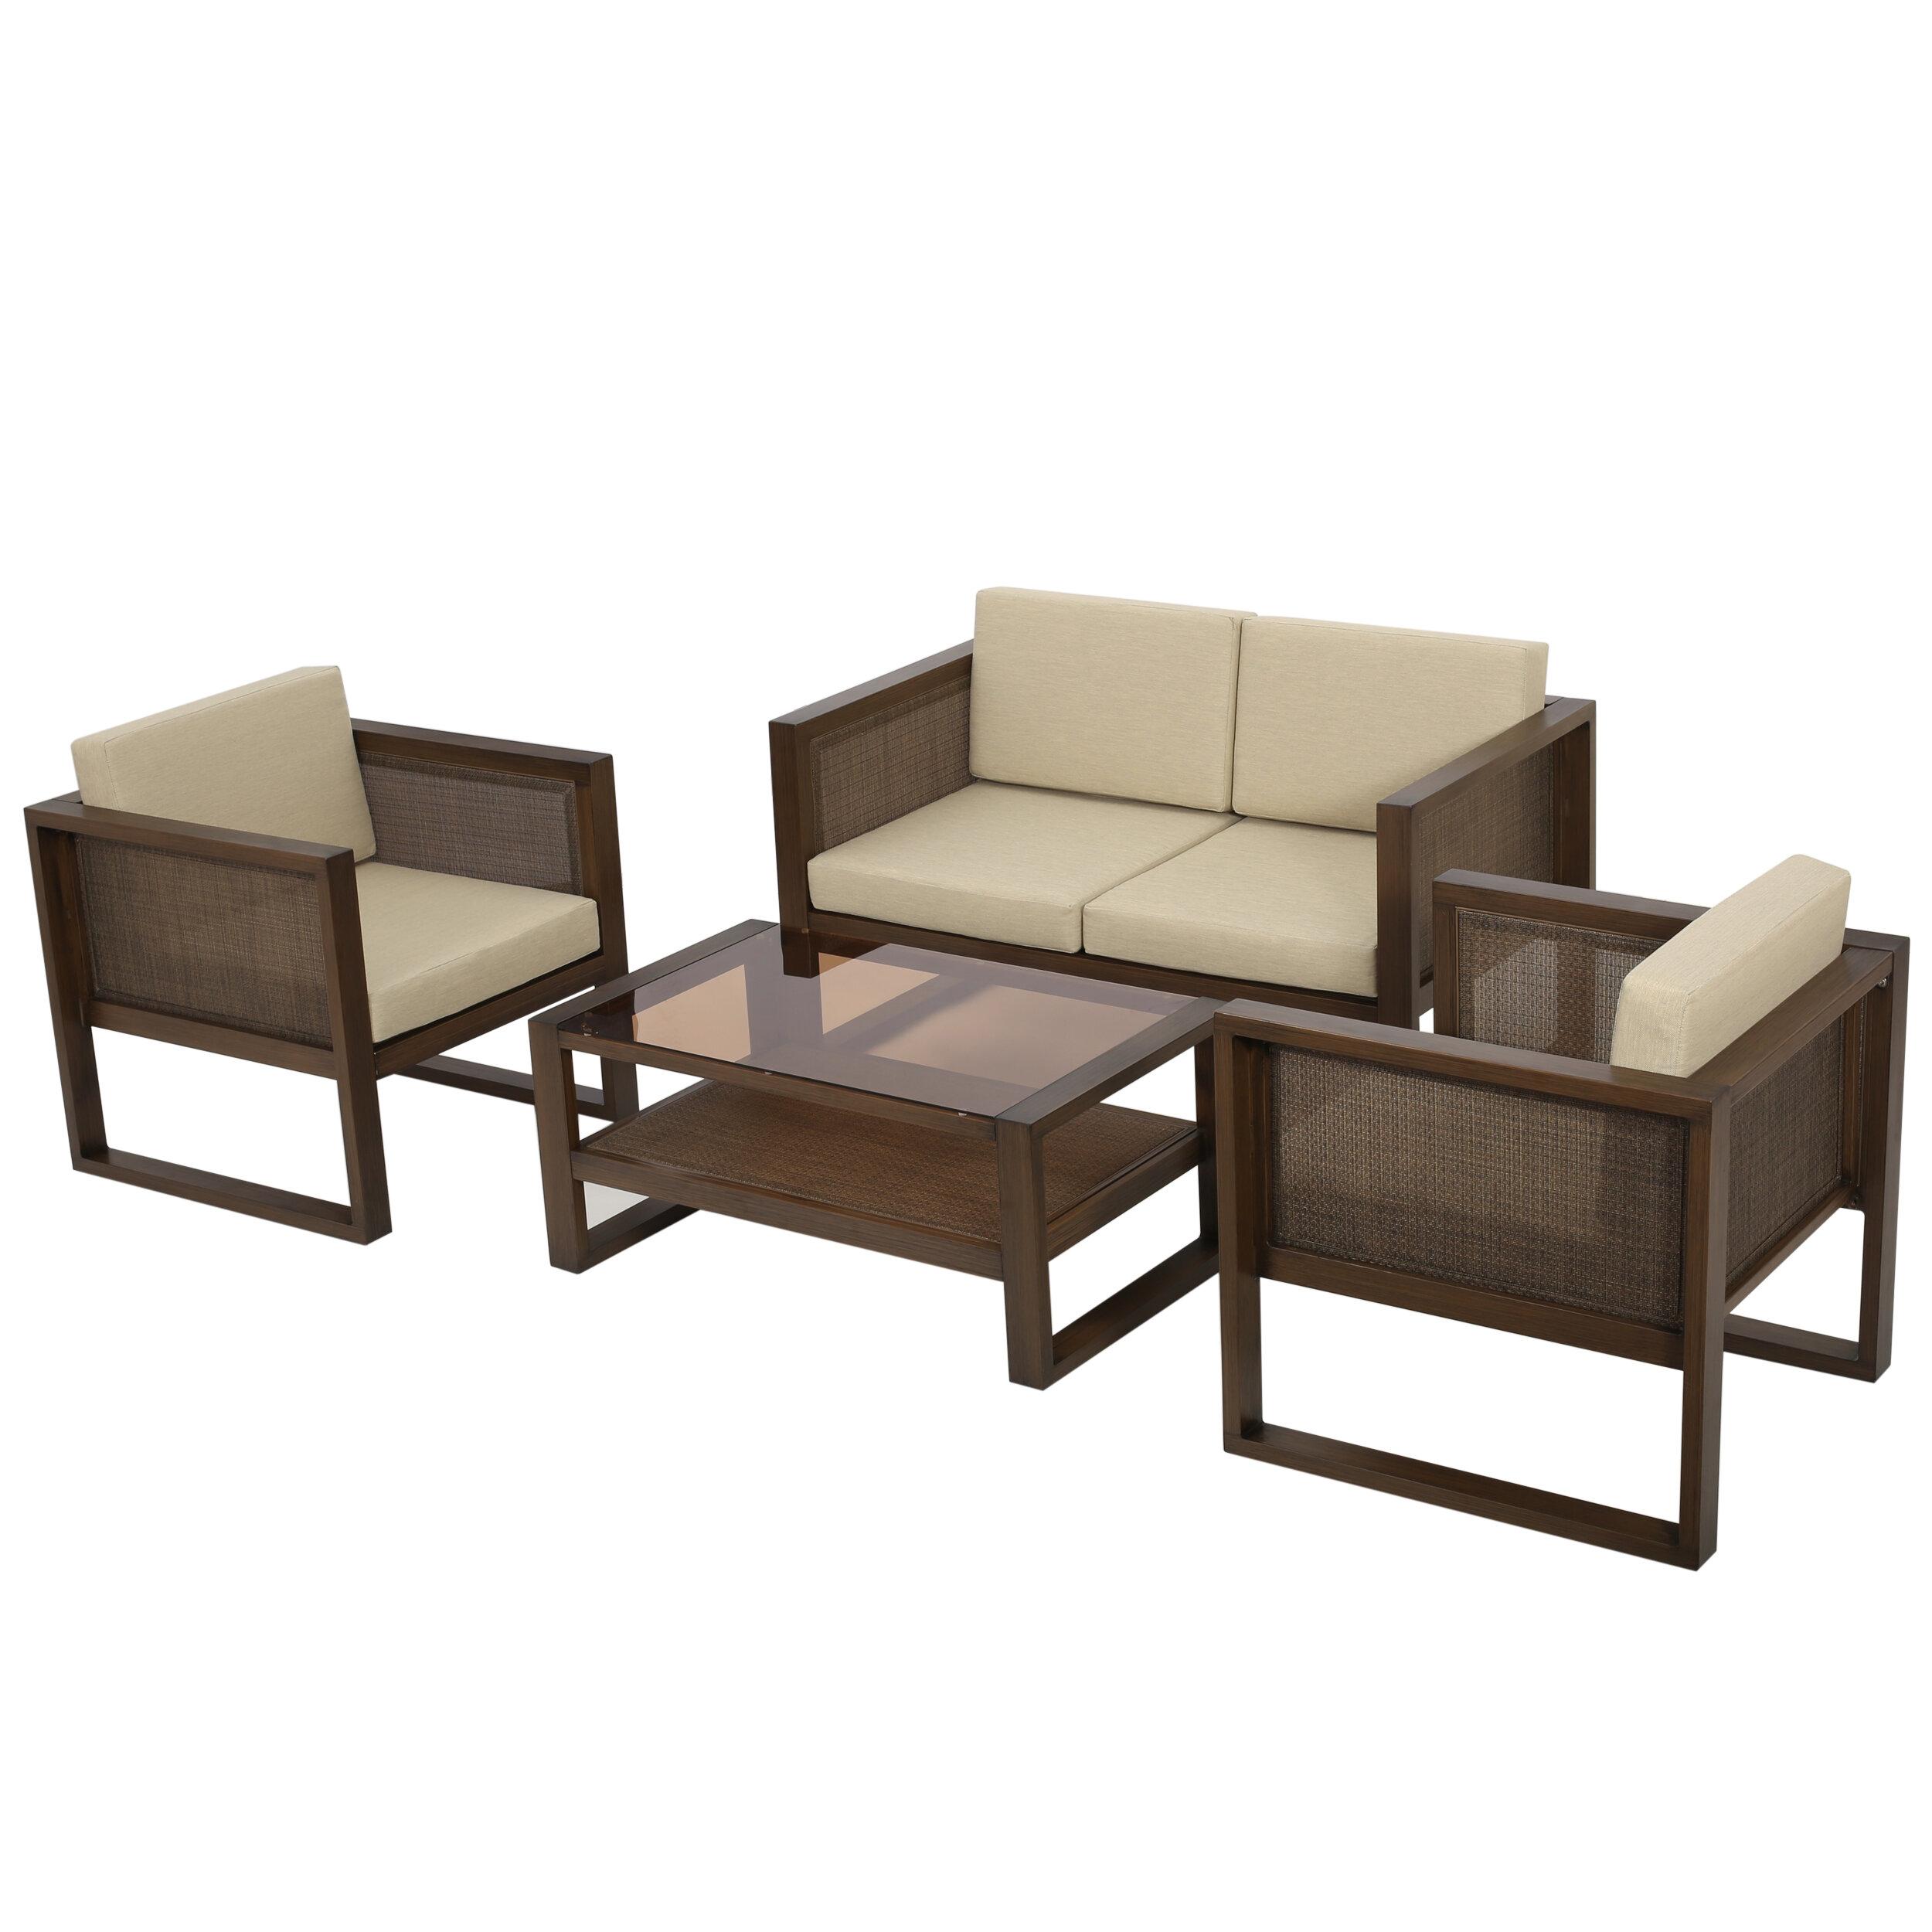 Corrigan Studio Valmonte 4 Piece Sofa Seating Group With Cushions Reviews Wayfair